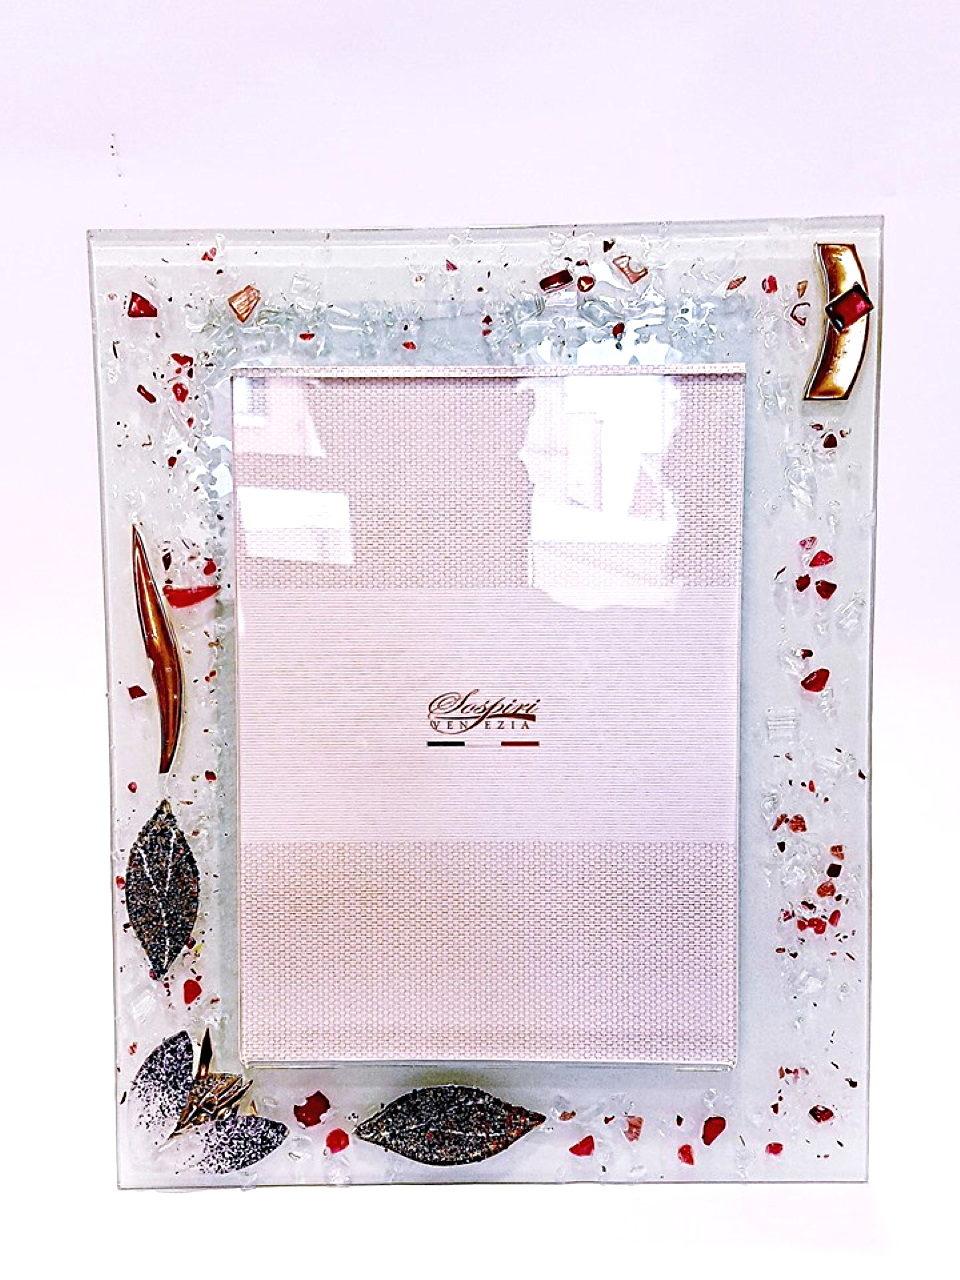 Portafoto azalea 19 x 15 cm vetro veneziano